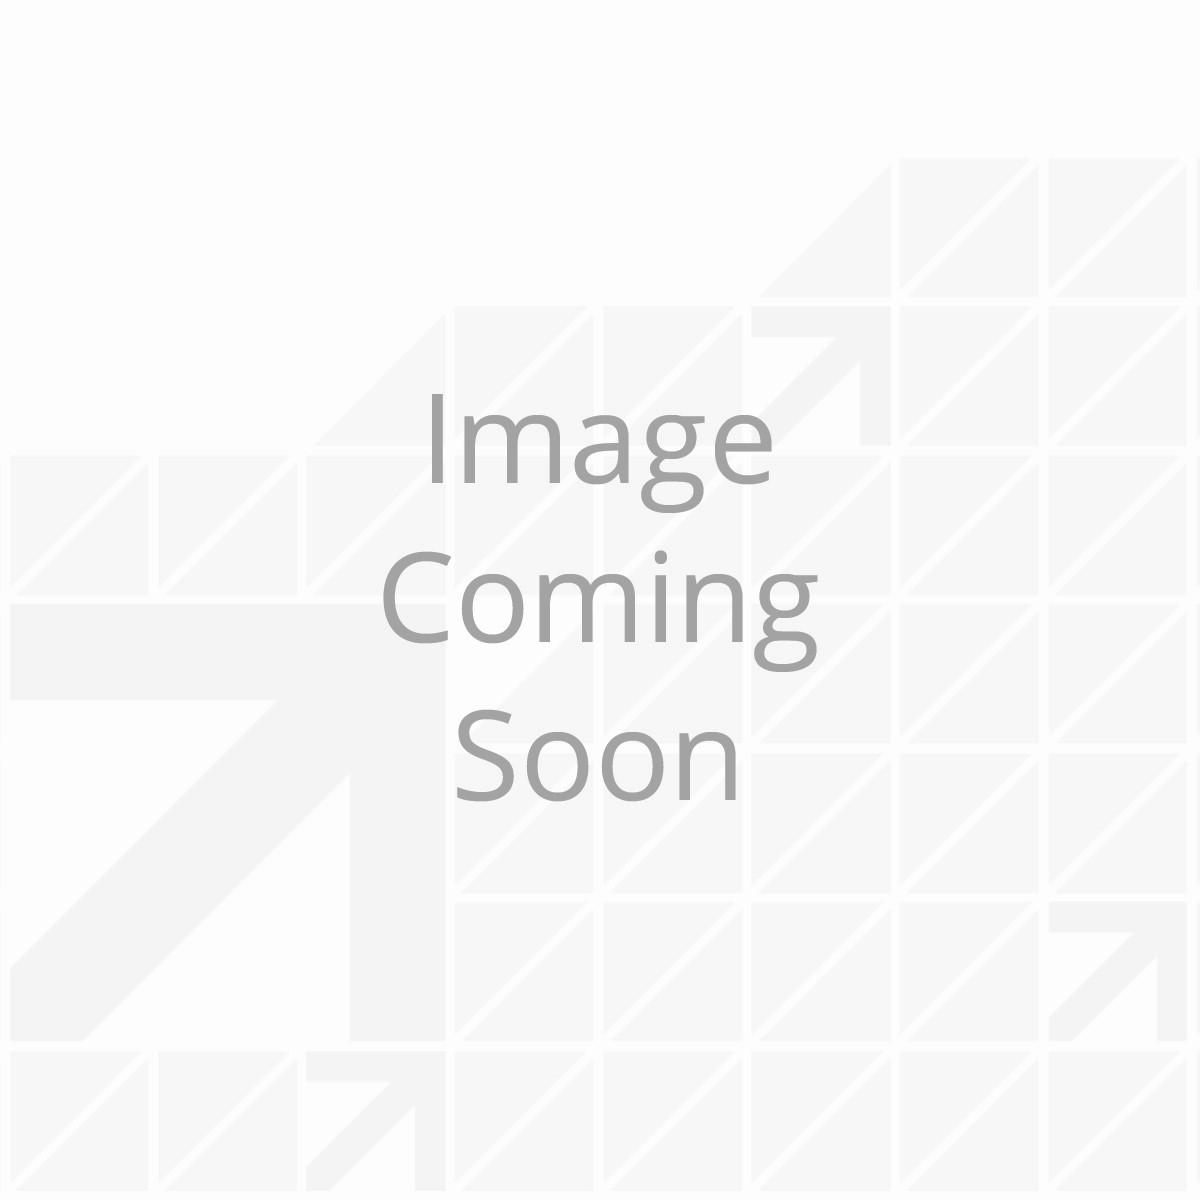 Door Insert Panel for 10 cu ft Refrigerator, High Gloss Black